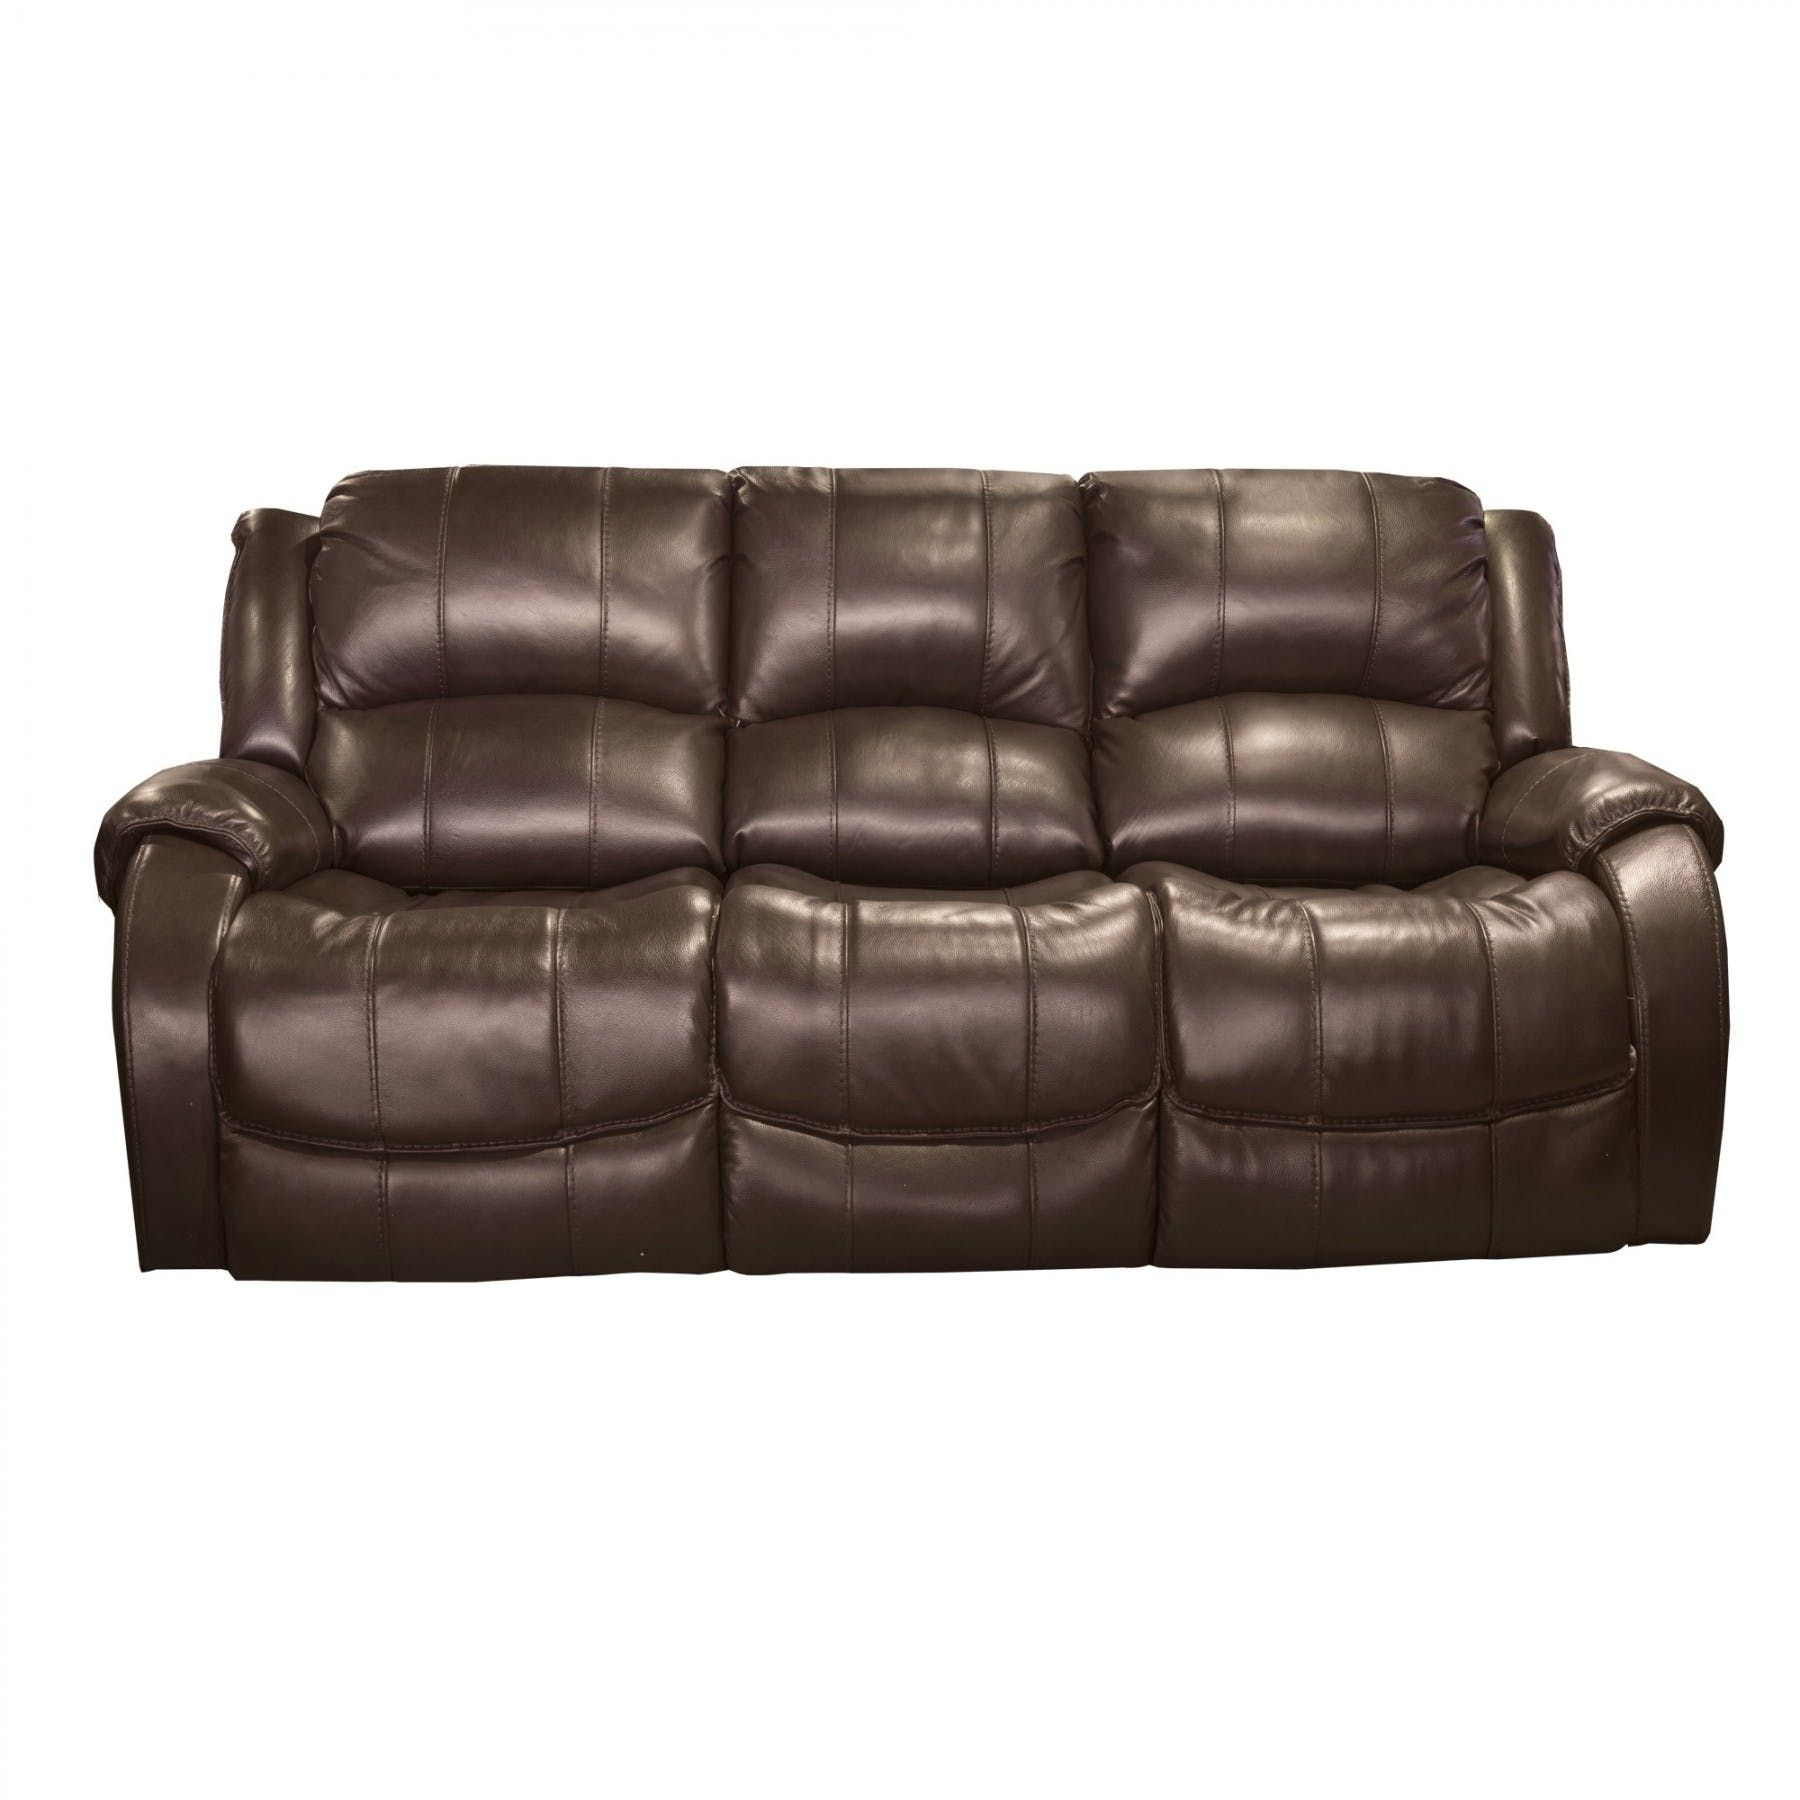 Best Cognac Power Reclining Sofa With Power Headrest Sofas 640 x 480